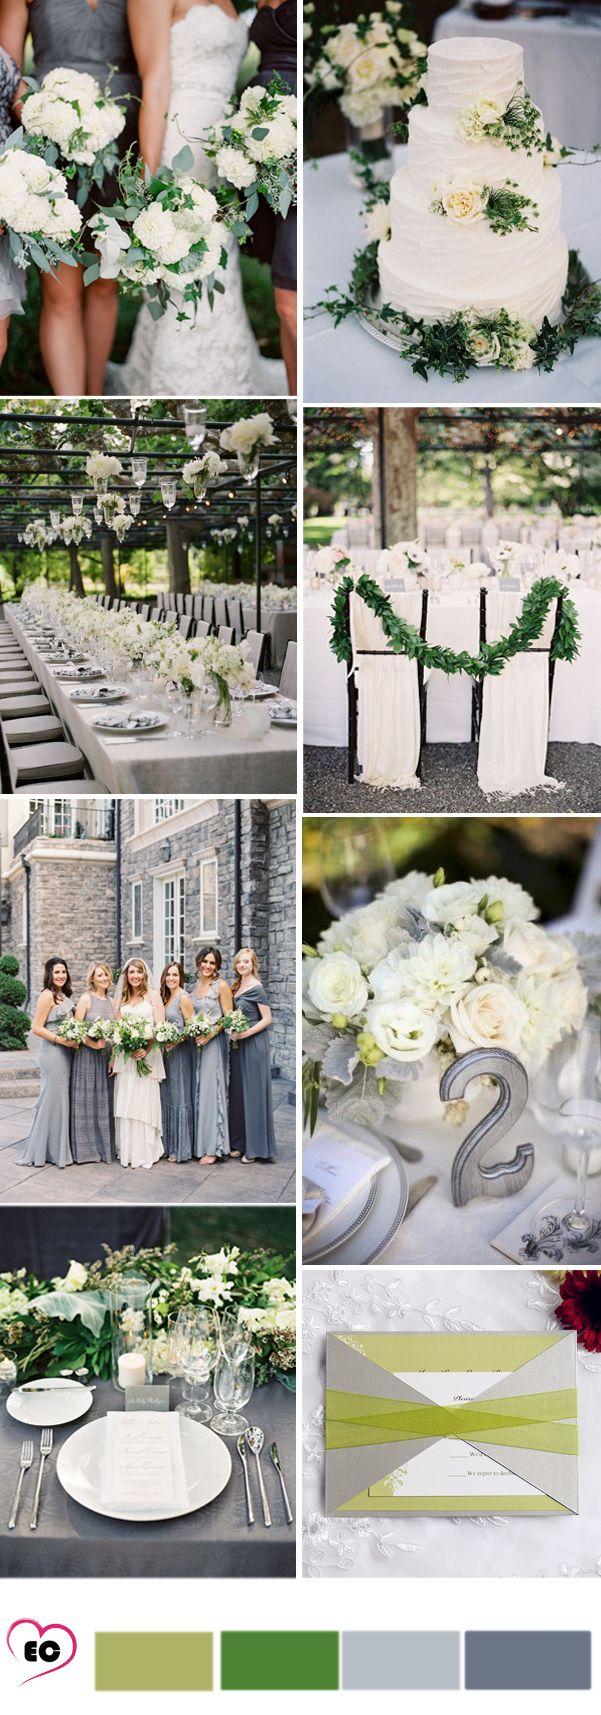 7 grey color palette wedding ideas inspirations wedding